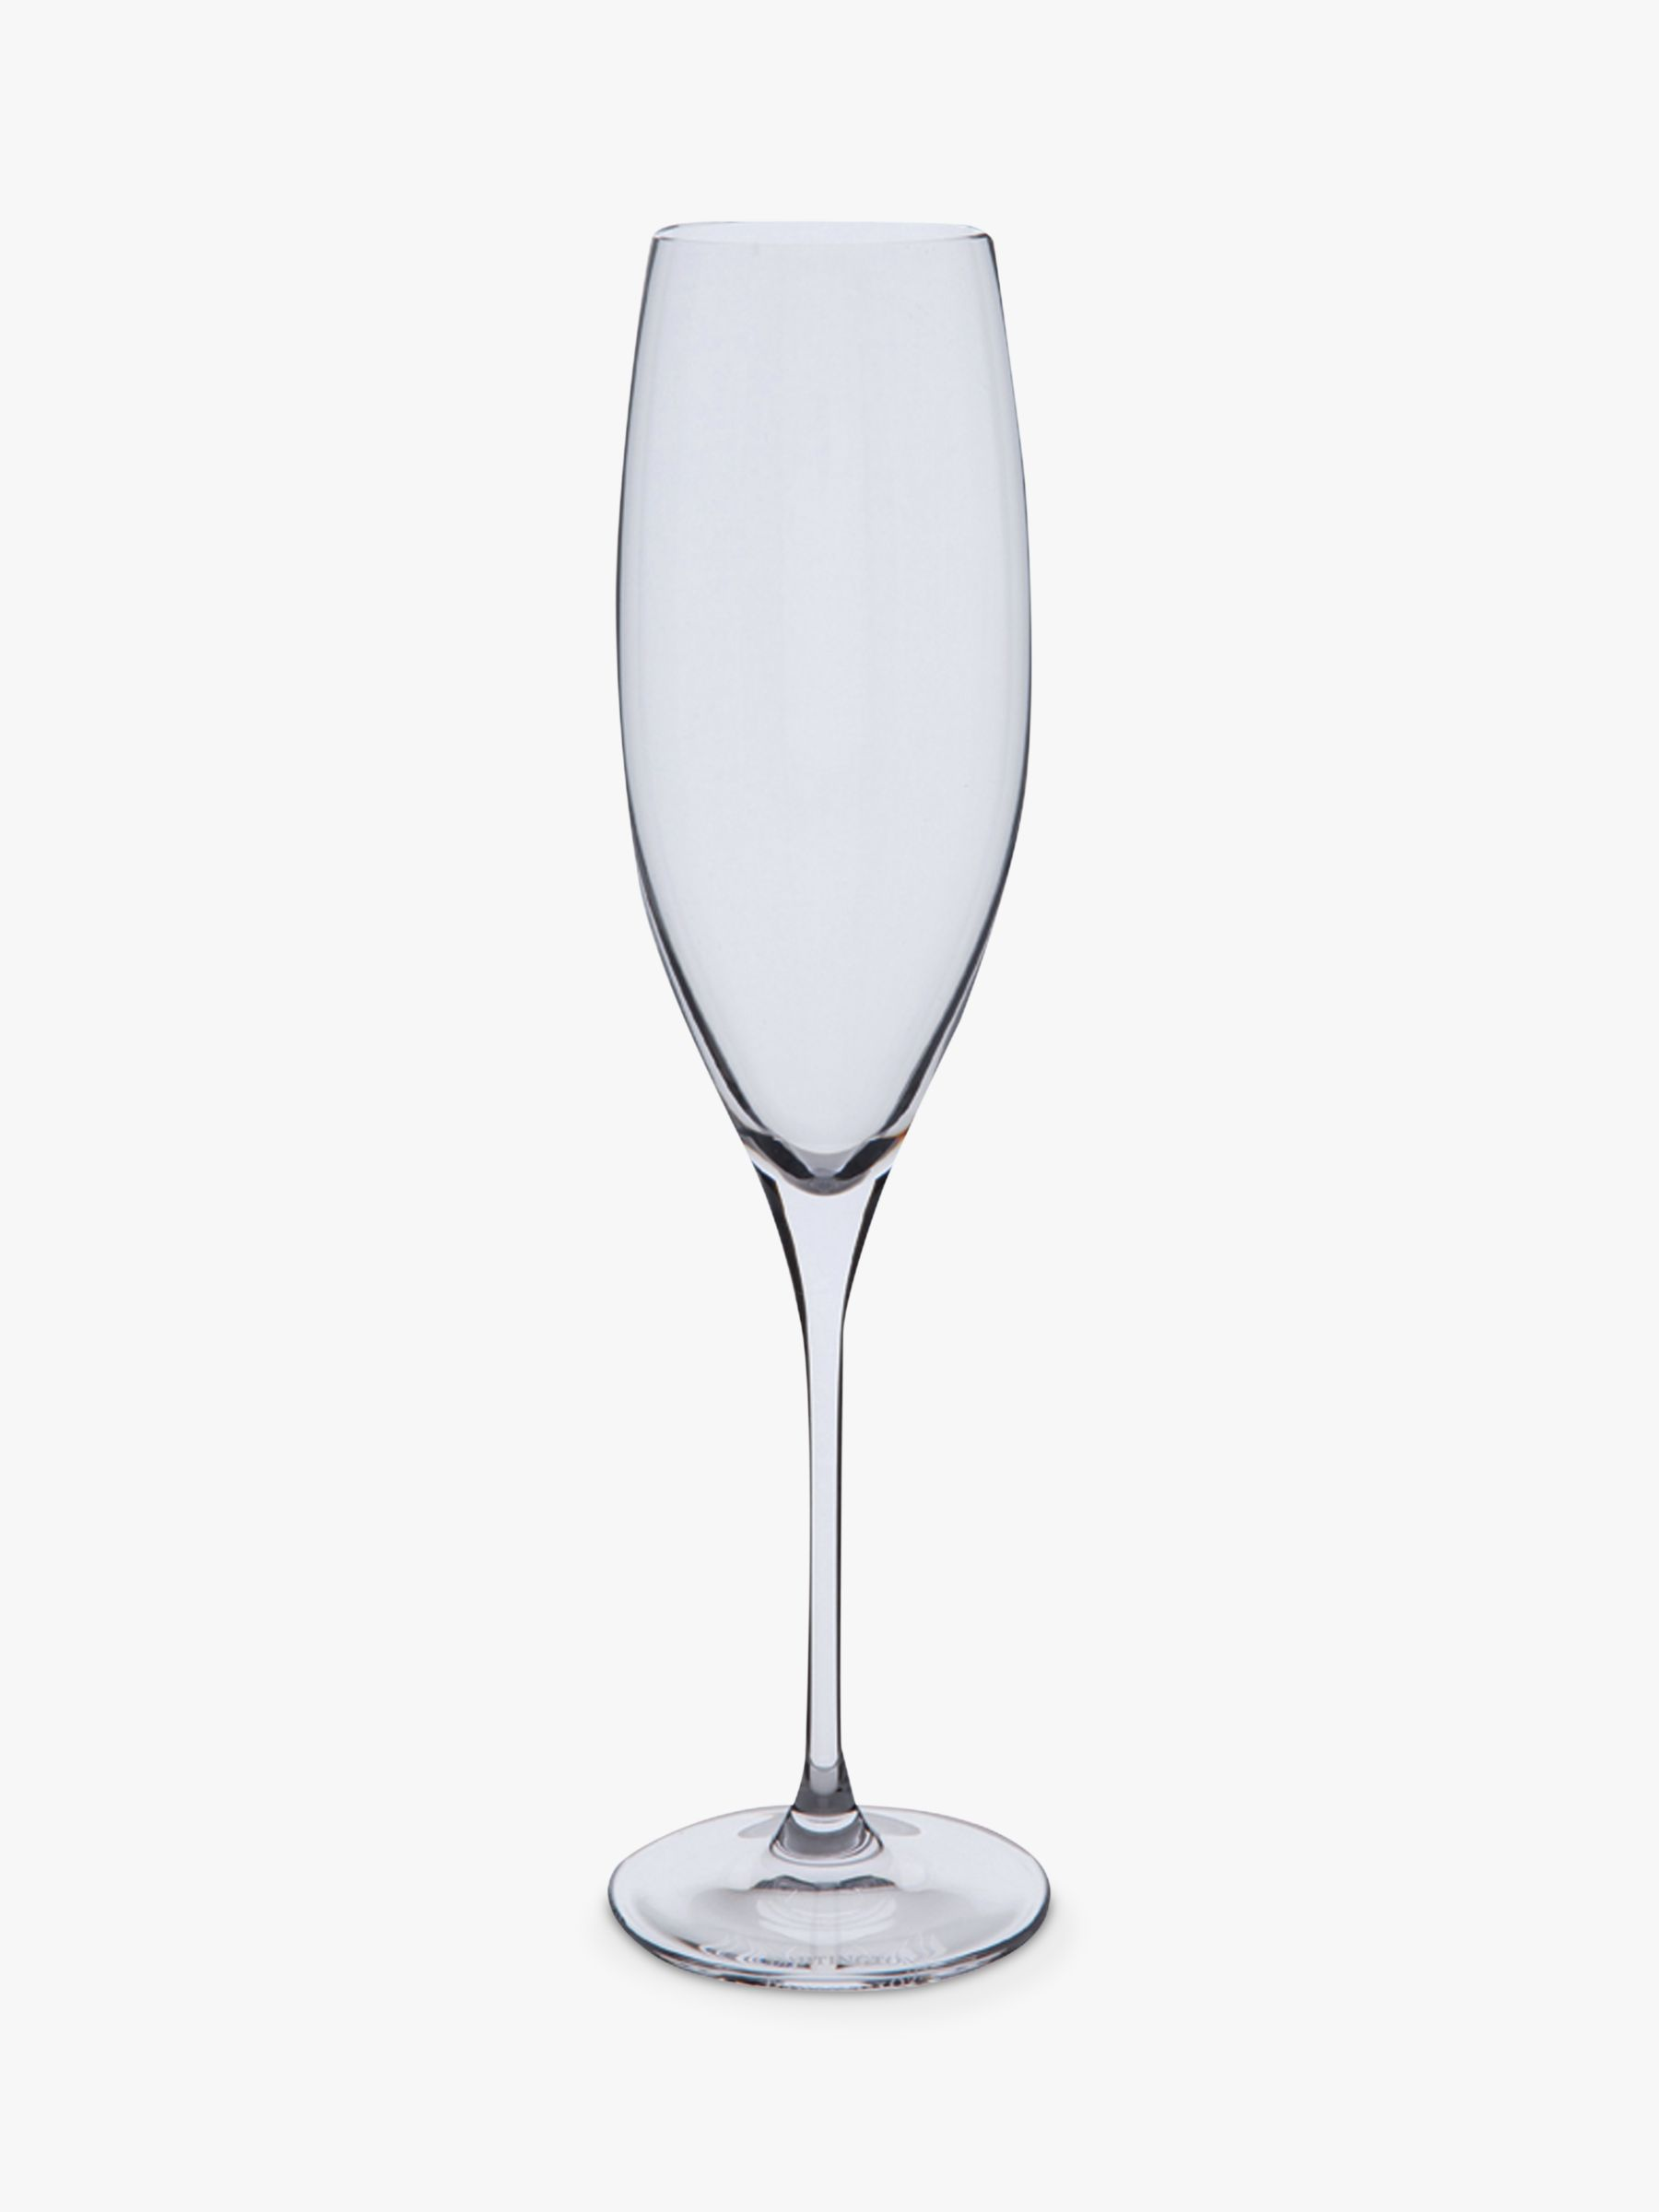 Dartington Crystal Dartington Crystal Personalised Wine Master Flute (Single), Gabriola Font